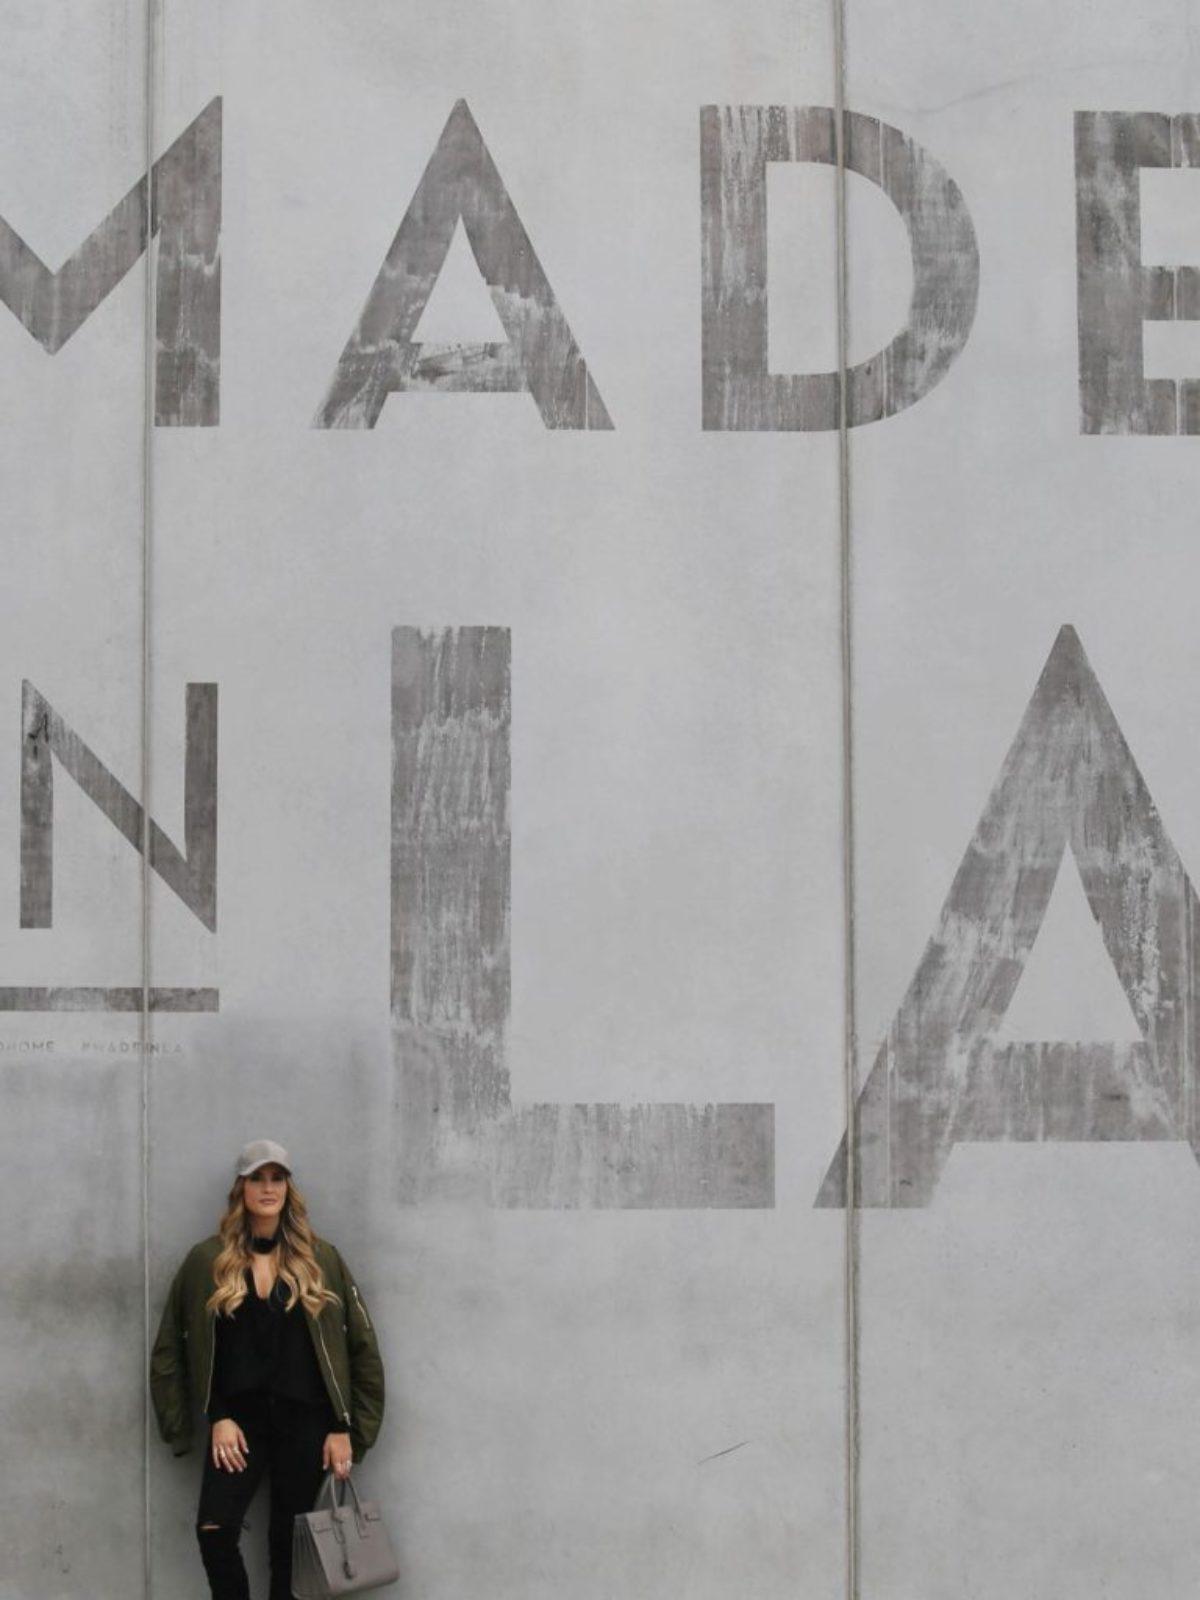 LA wall_made in LA_sbk_4 Edit 1